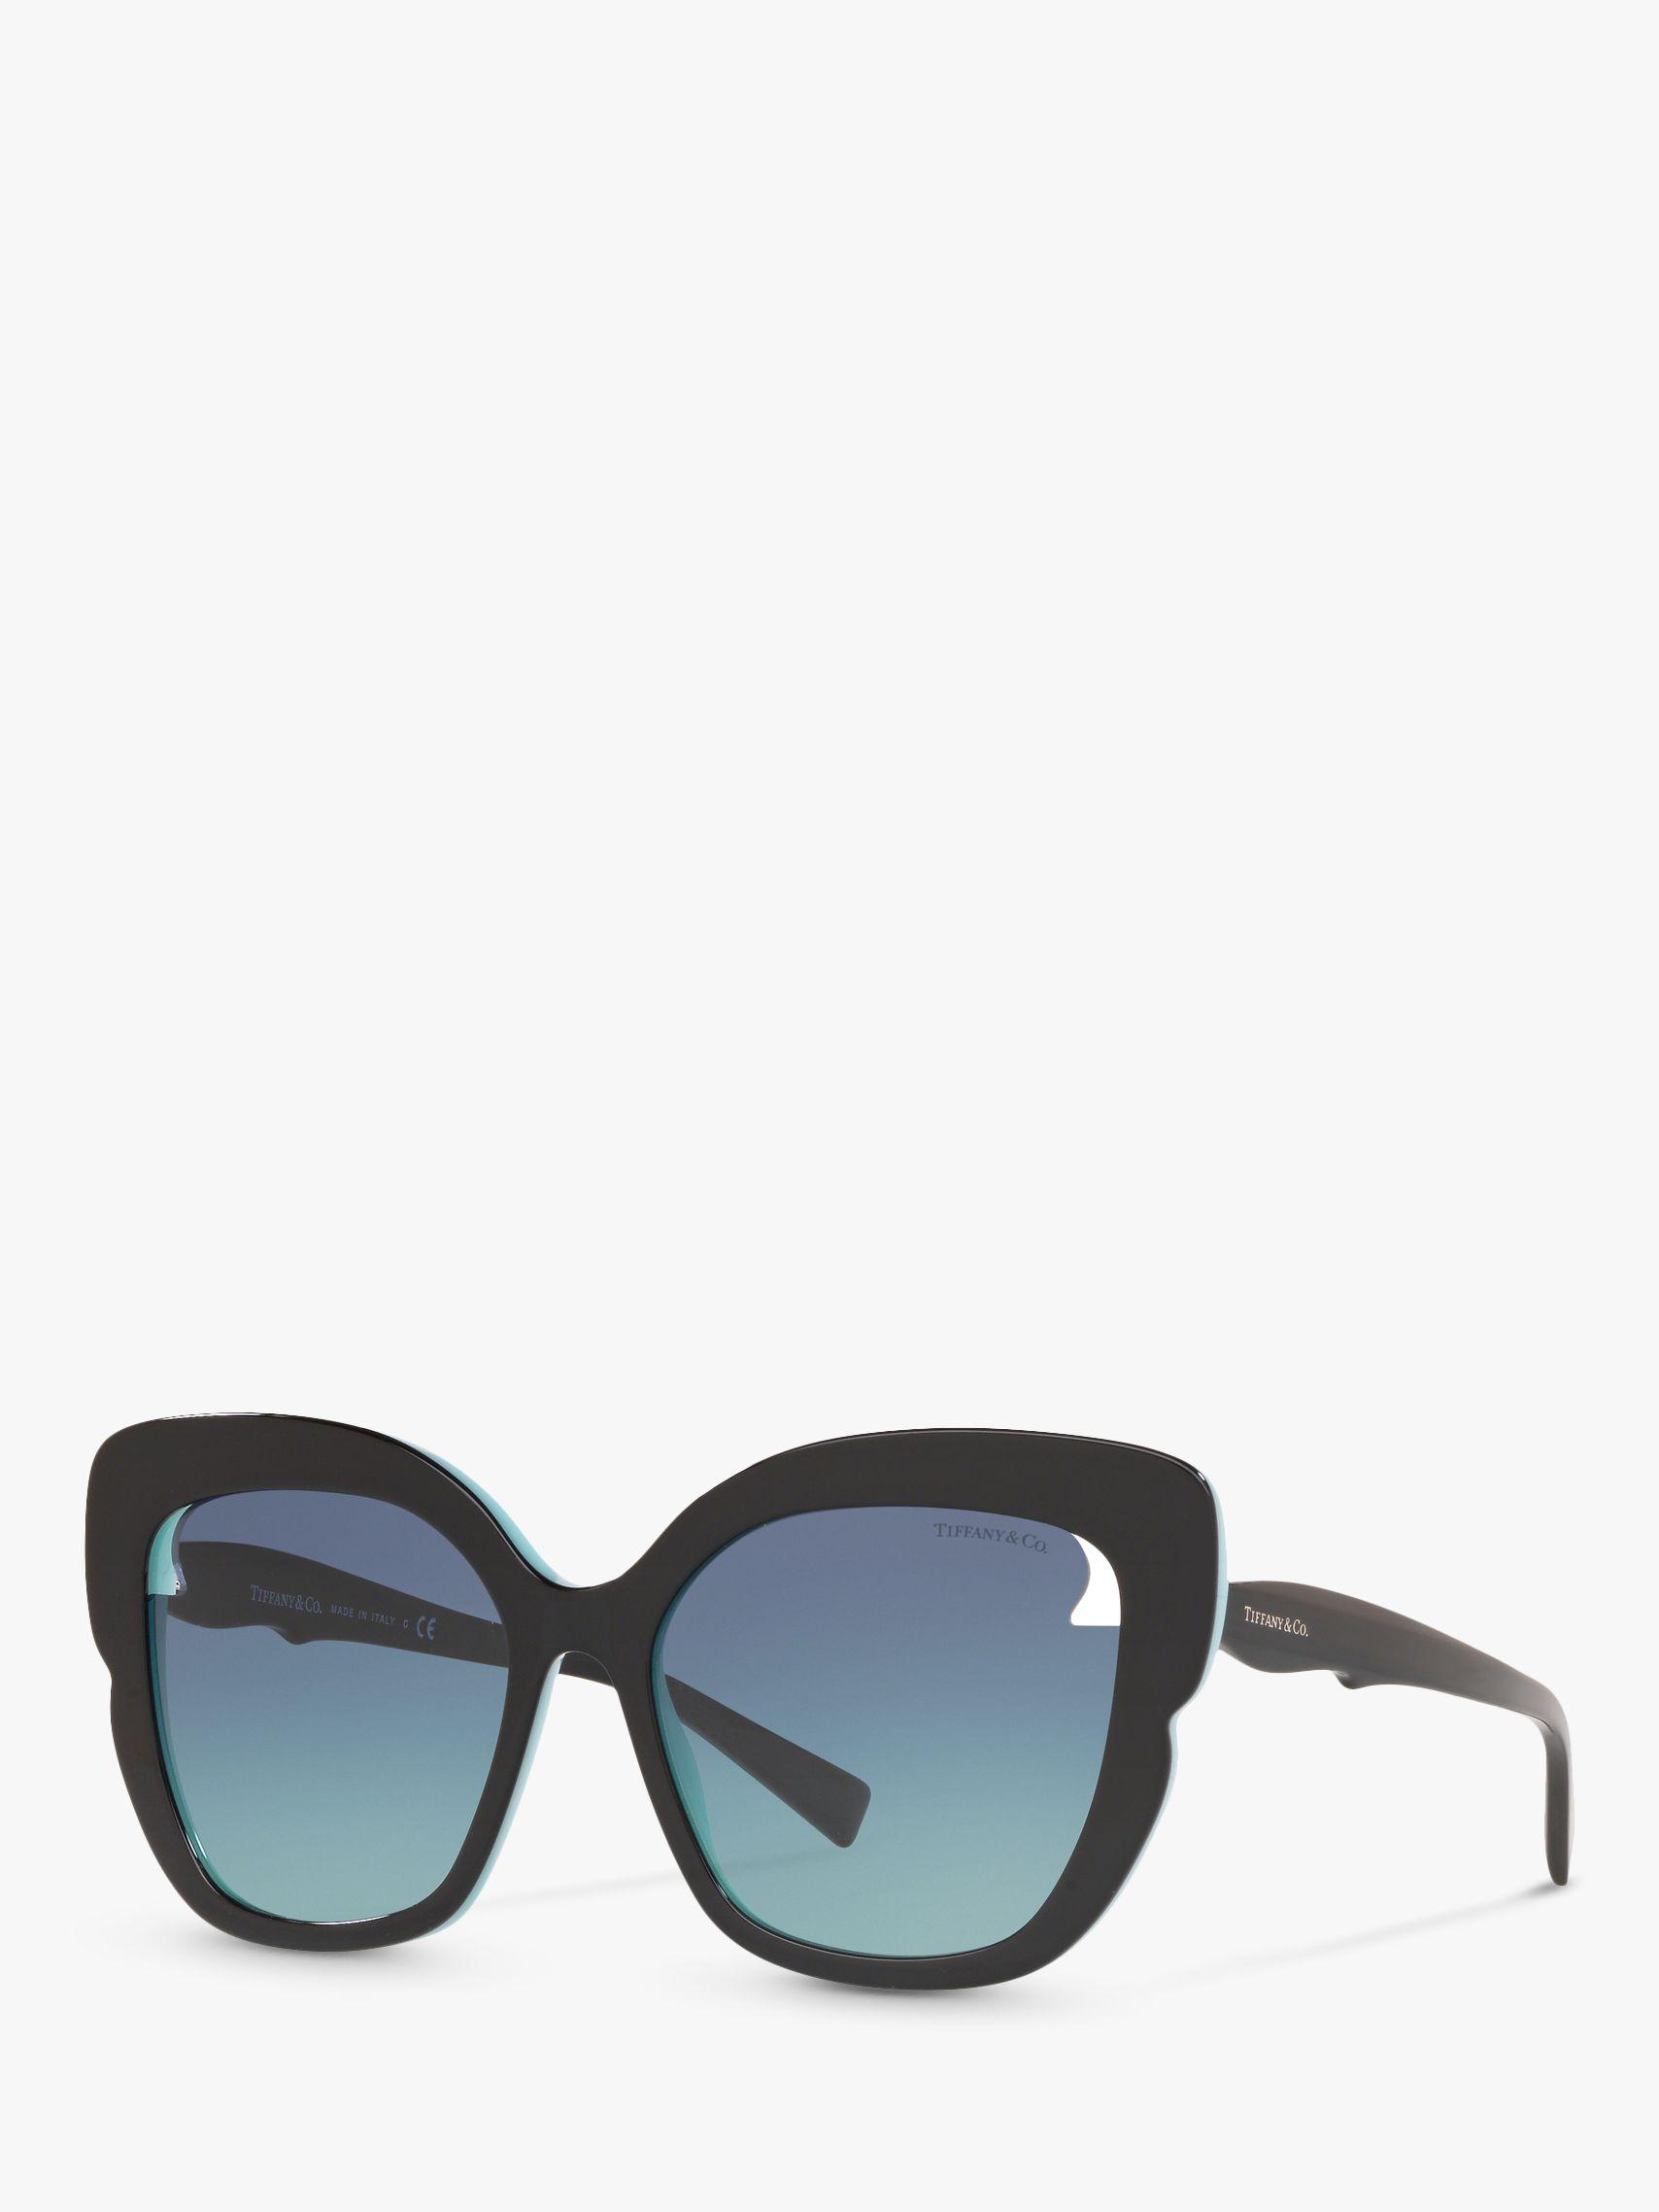 Tiffany & Co Tiffany & Co TF4161 Women's Square Sunglasses, Black/Blue